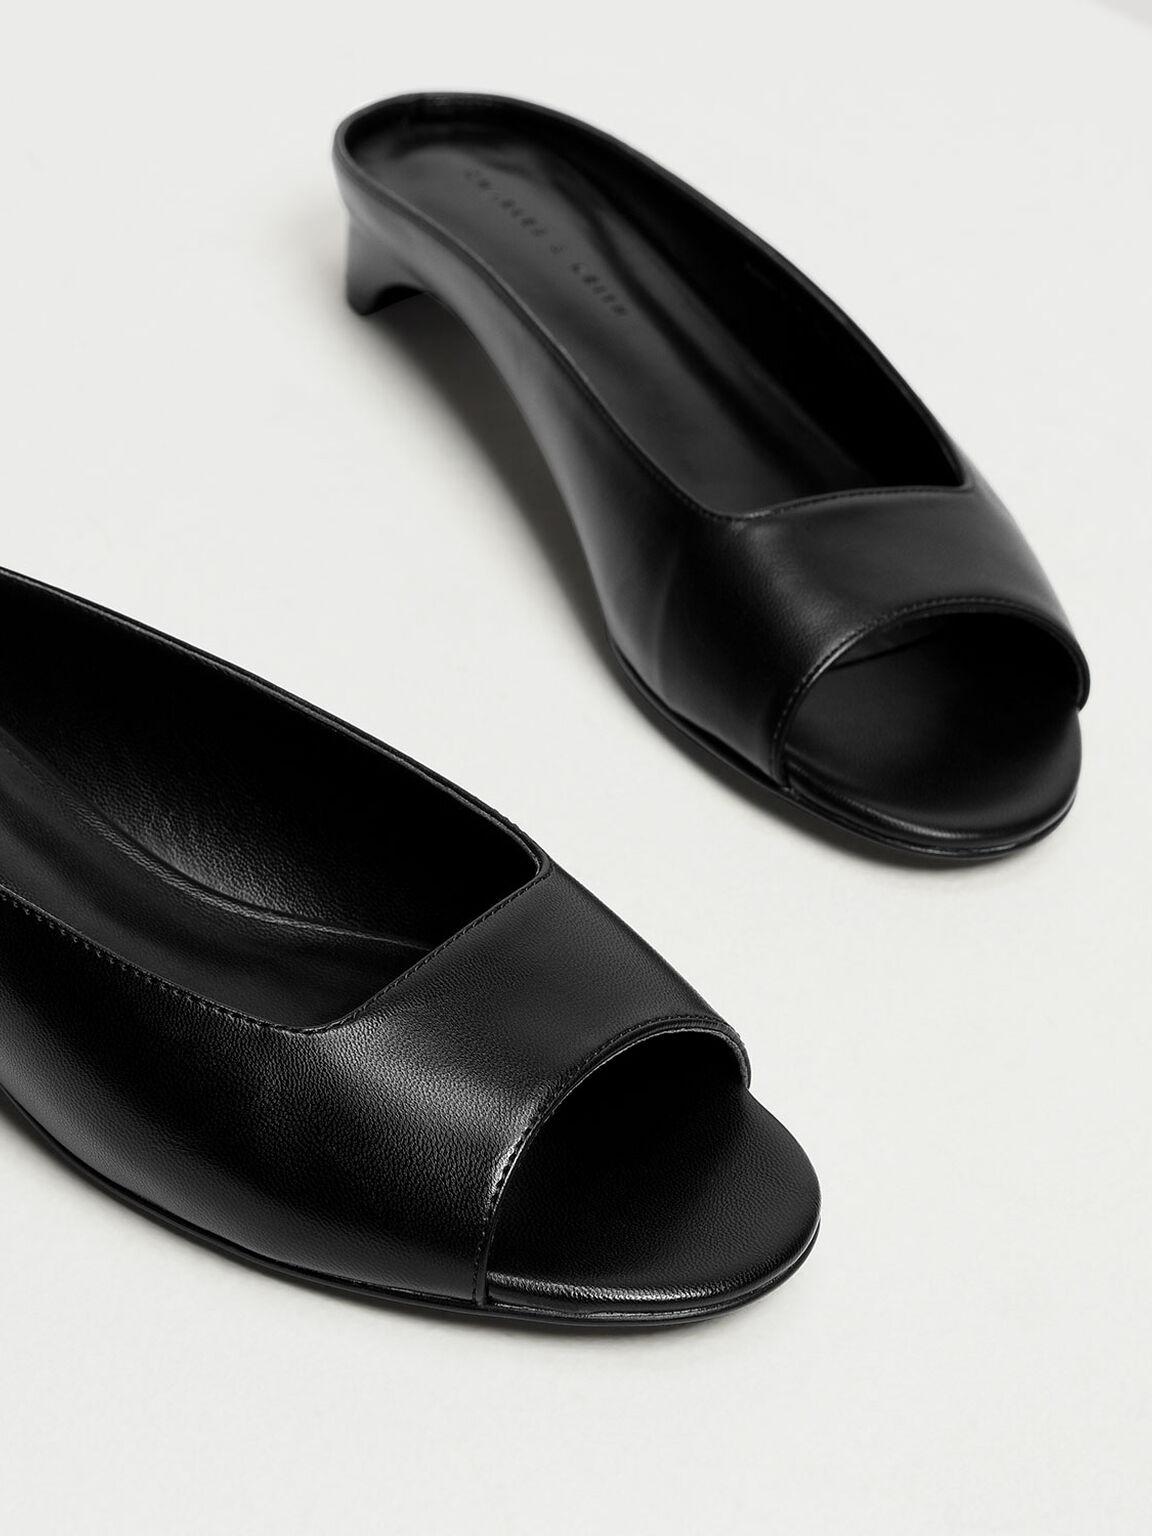 Geometric Cut Kitten Heel Slide Sandals, Black, hi-res